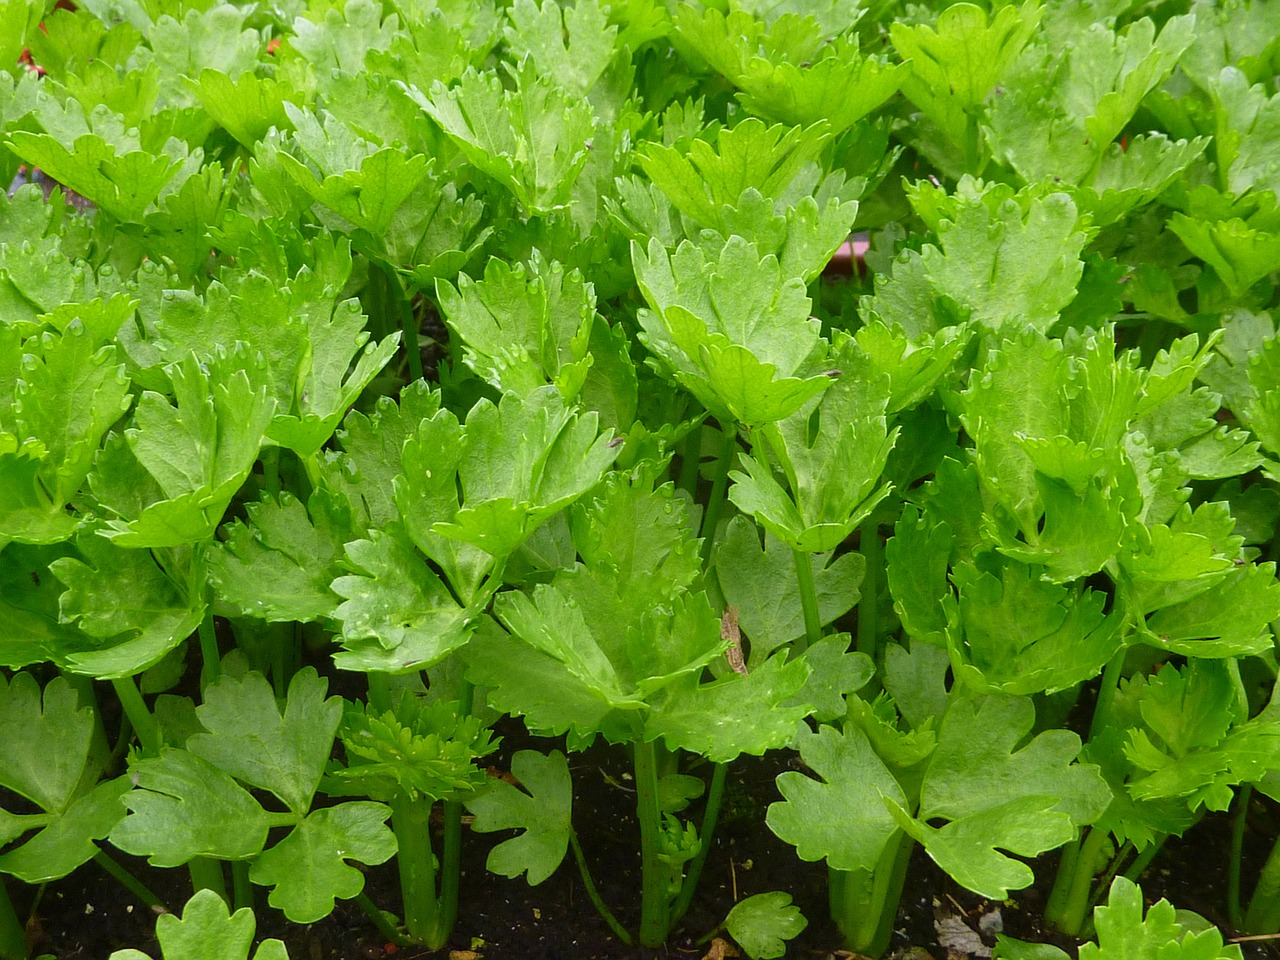 celery-639899_1280.jpg